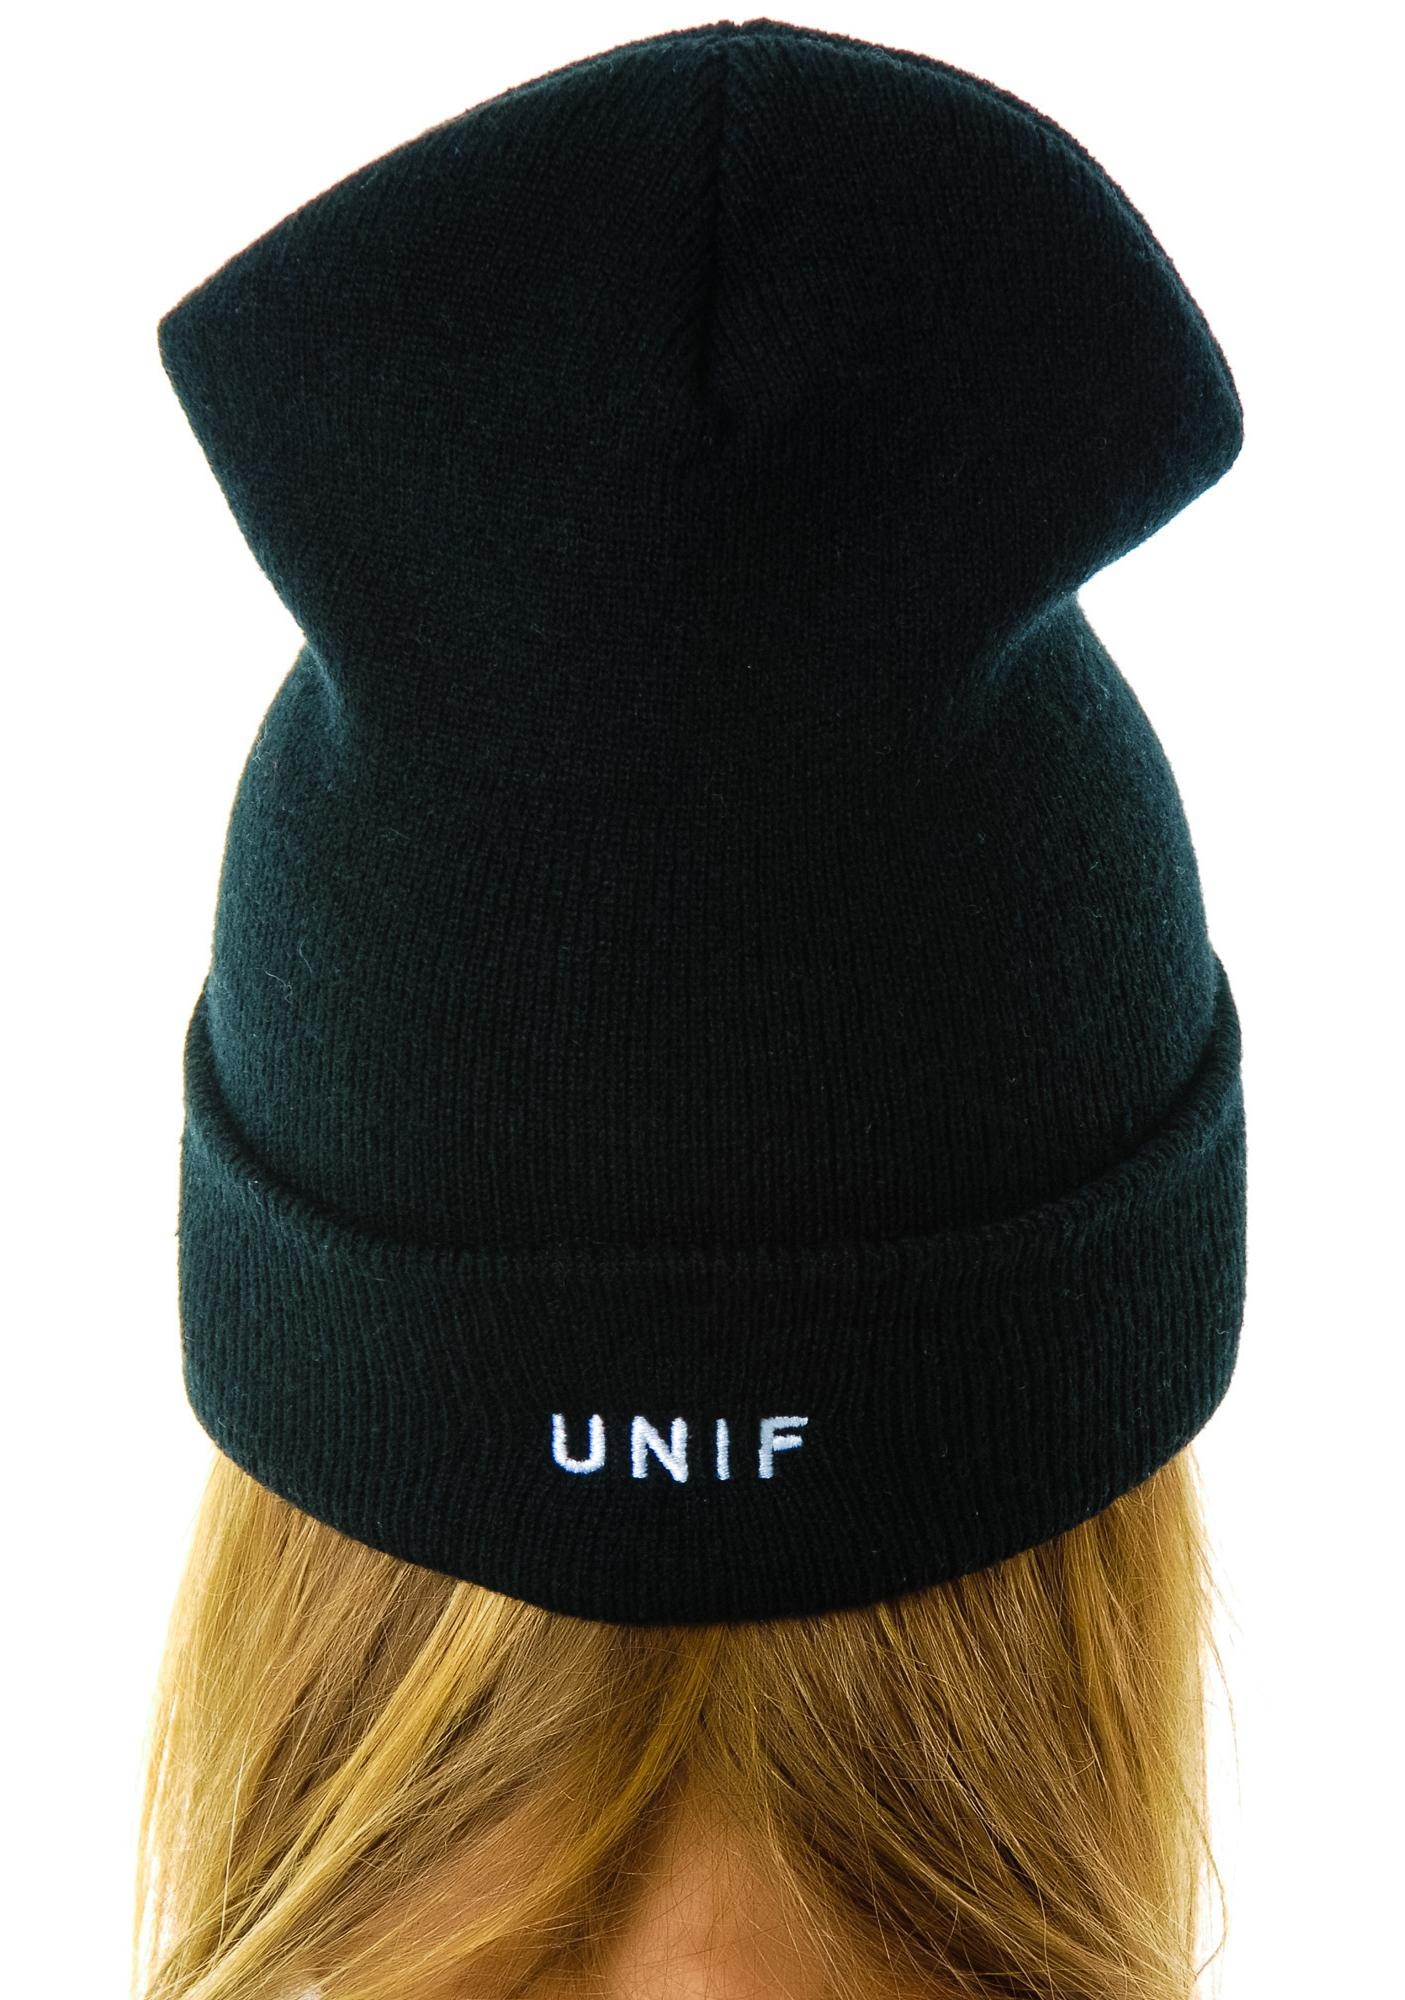 UNIF Logo Beanie